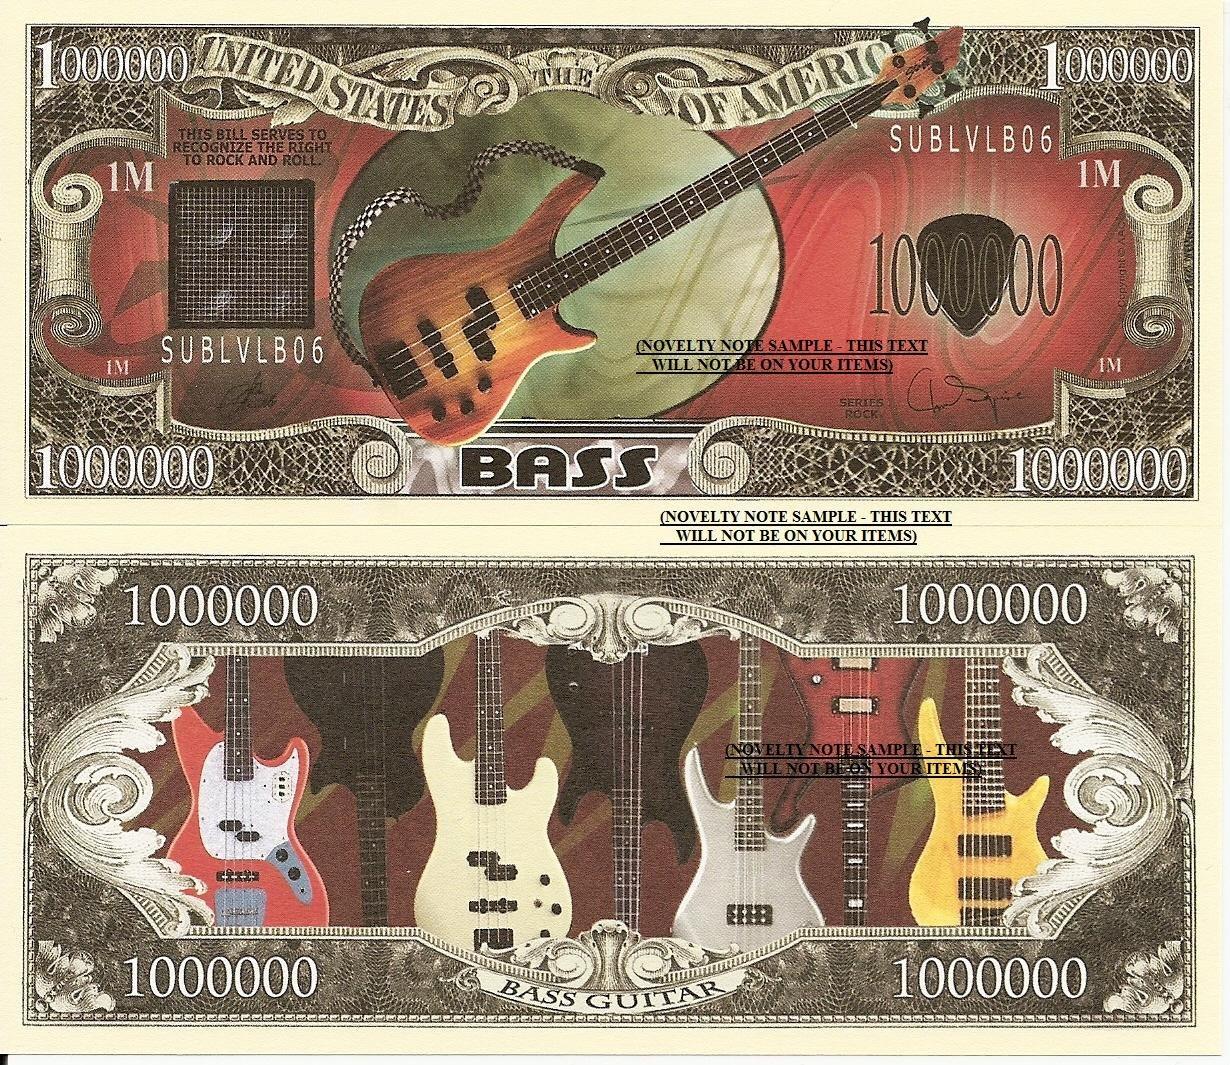 Bass Classic Guitar Drums Keyboard Musical Instruments Dollar Bills Set of 8